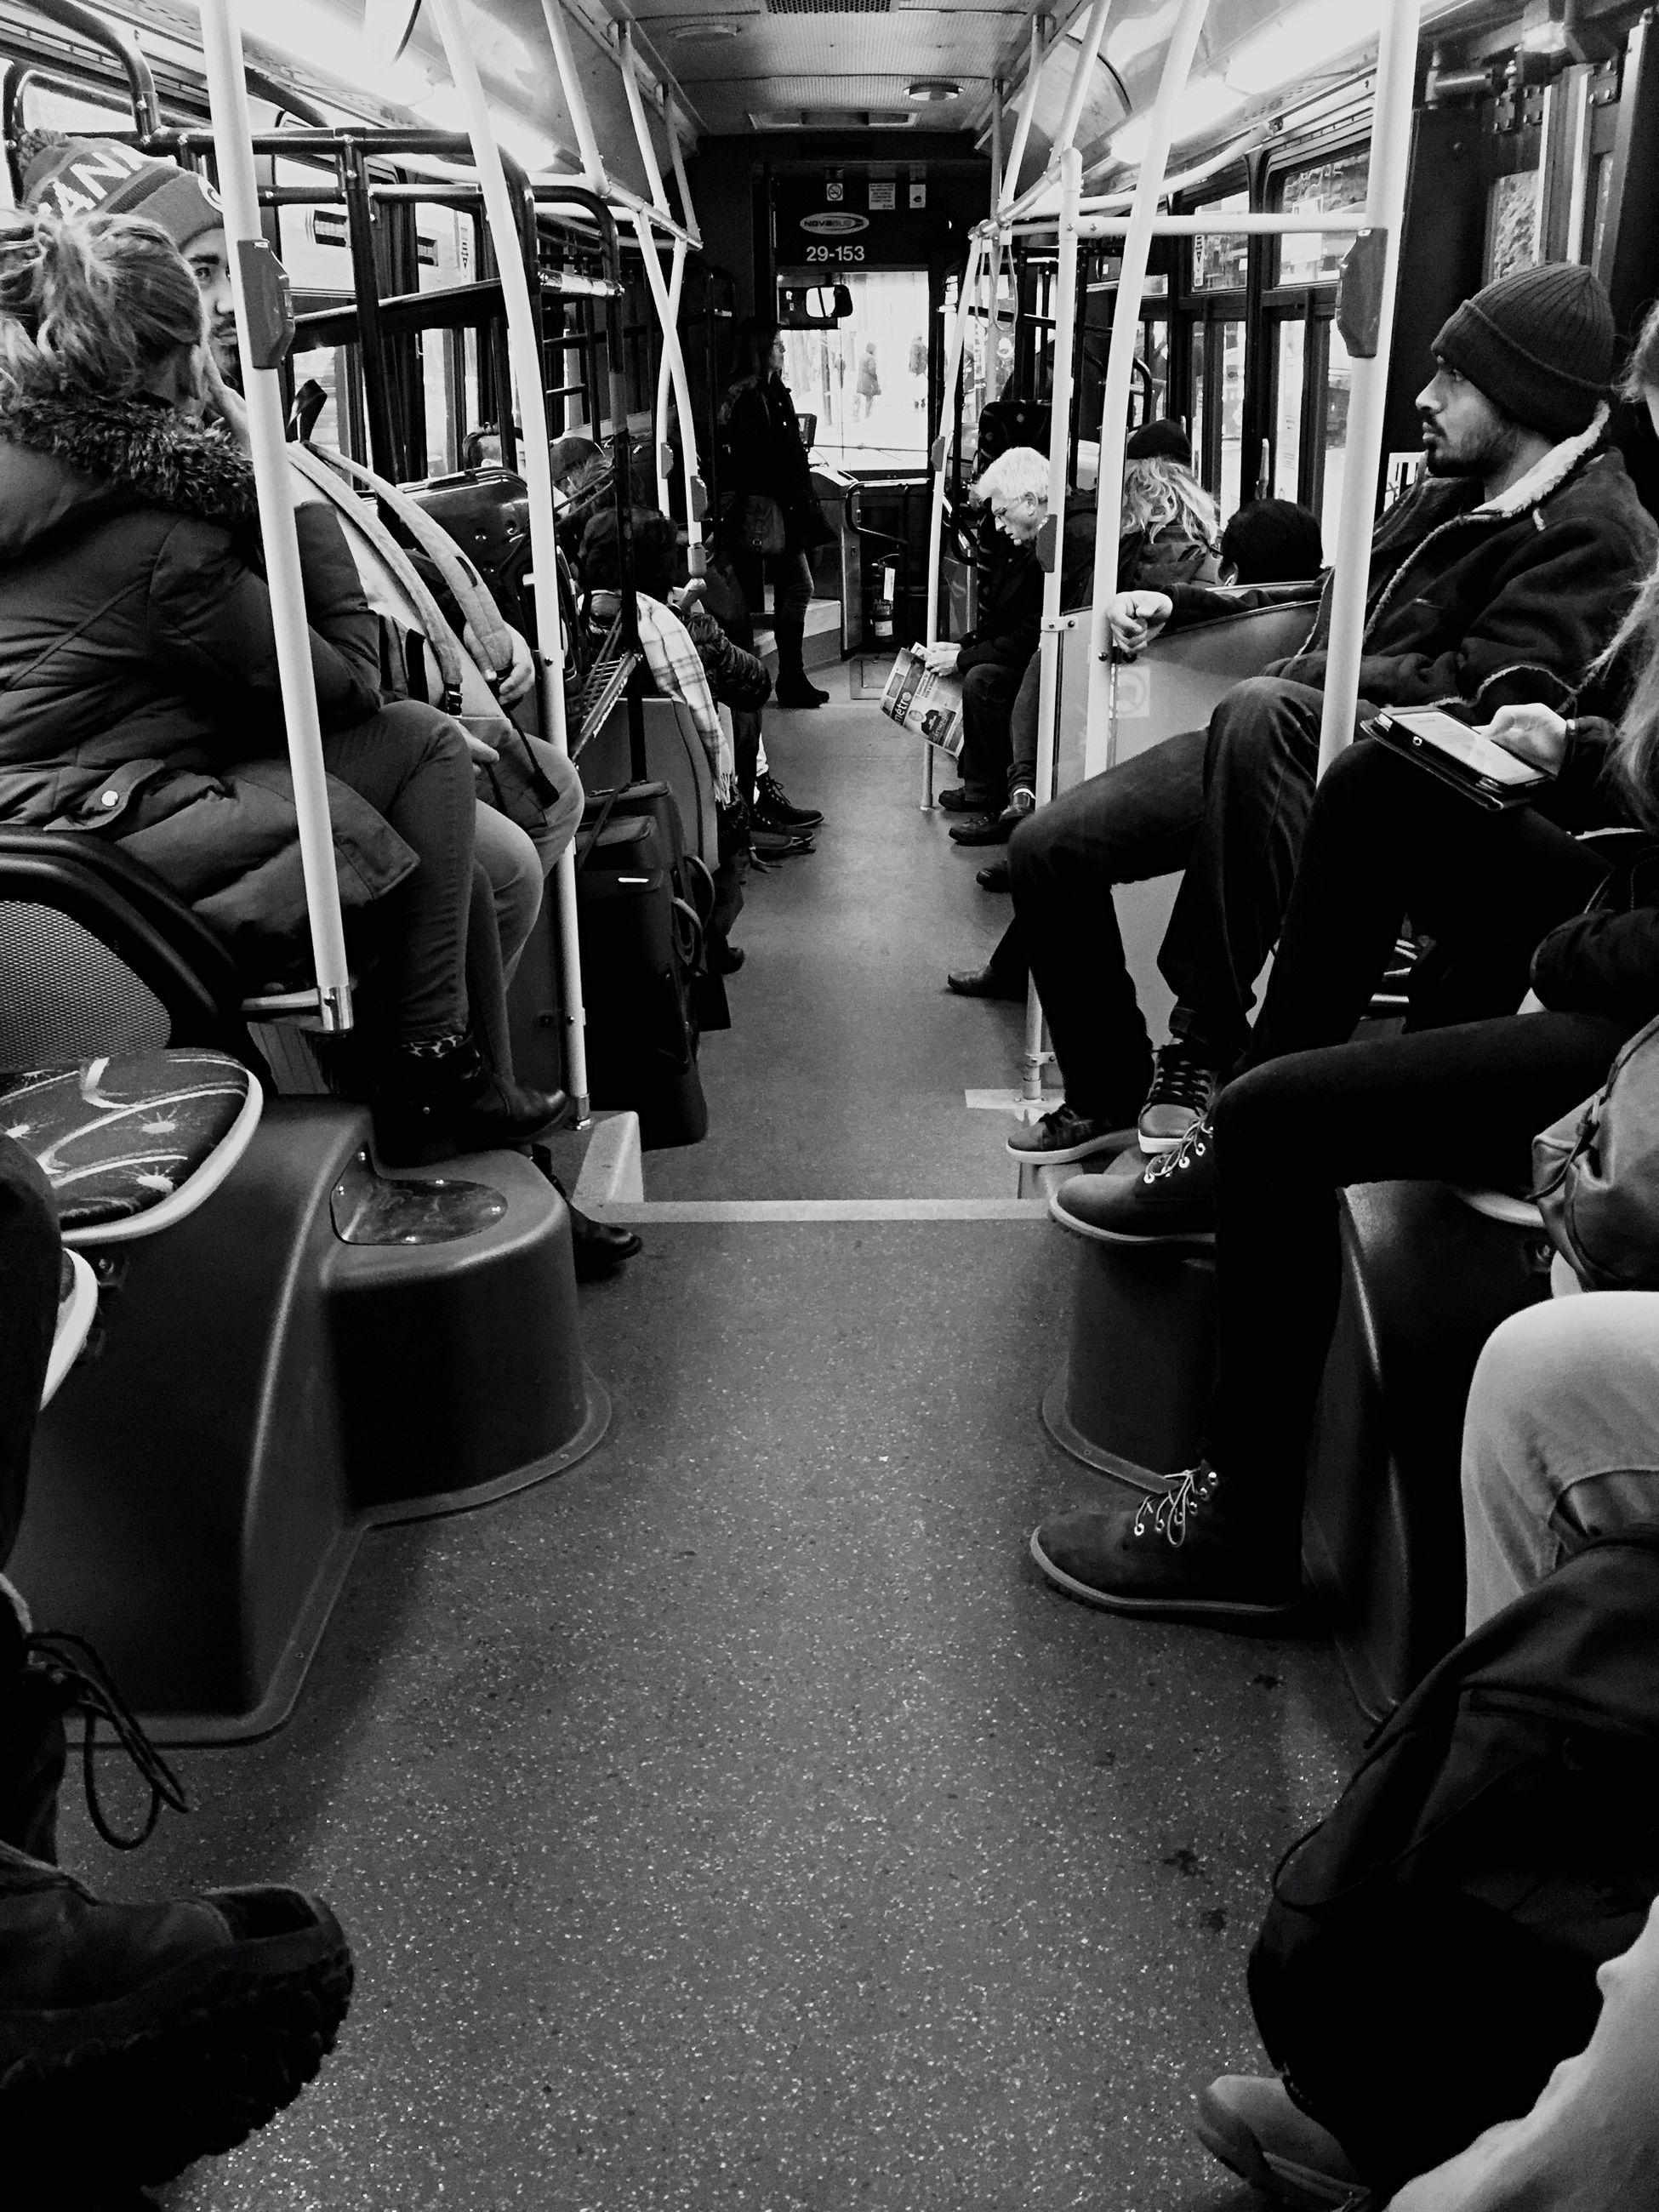 vehicle interior, train - vehicle, transportation, public transportation, subway train, mode of transport, sitting, passenger train, commuter train, vehicle seat, train interior, large group of people, real people, passenger, rail transportation, men, land vehicle, commuter, women, day, adult, people